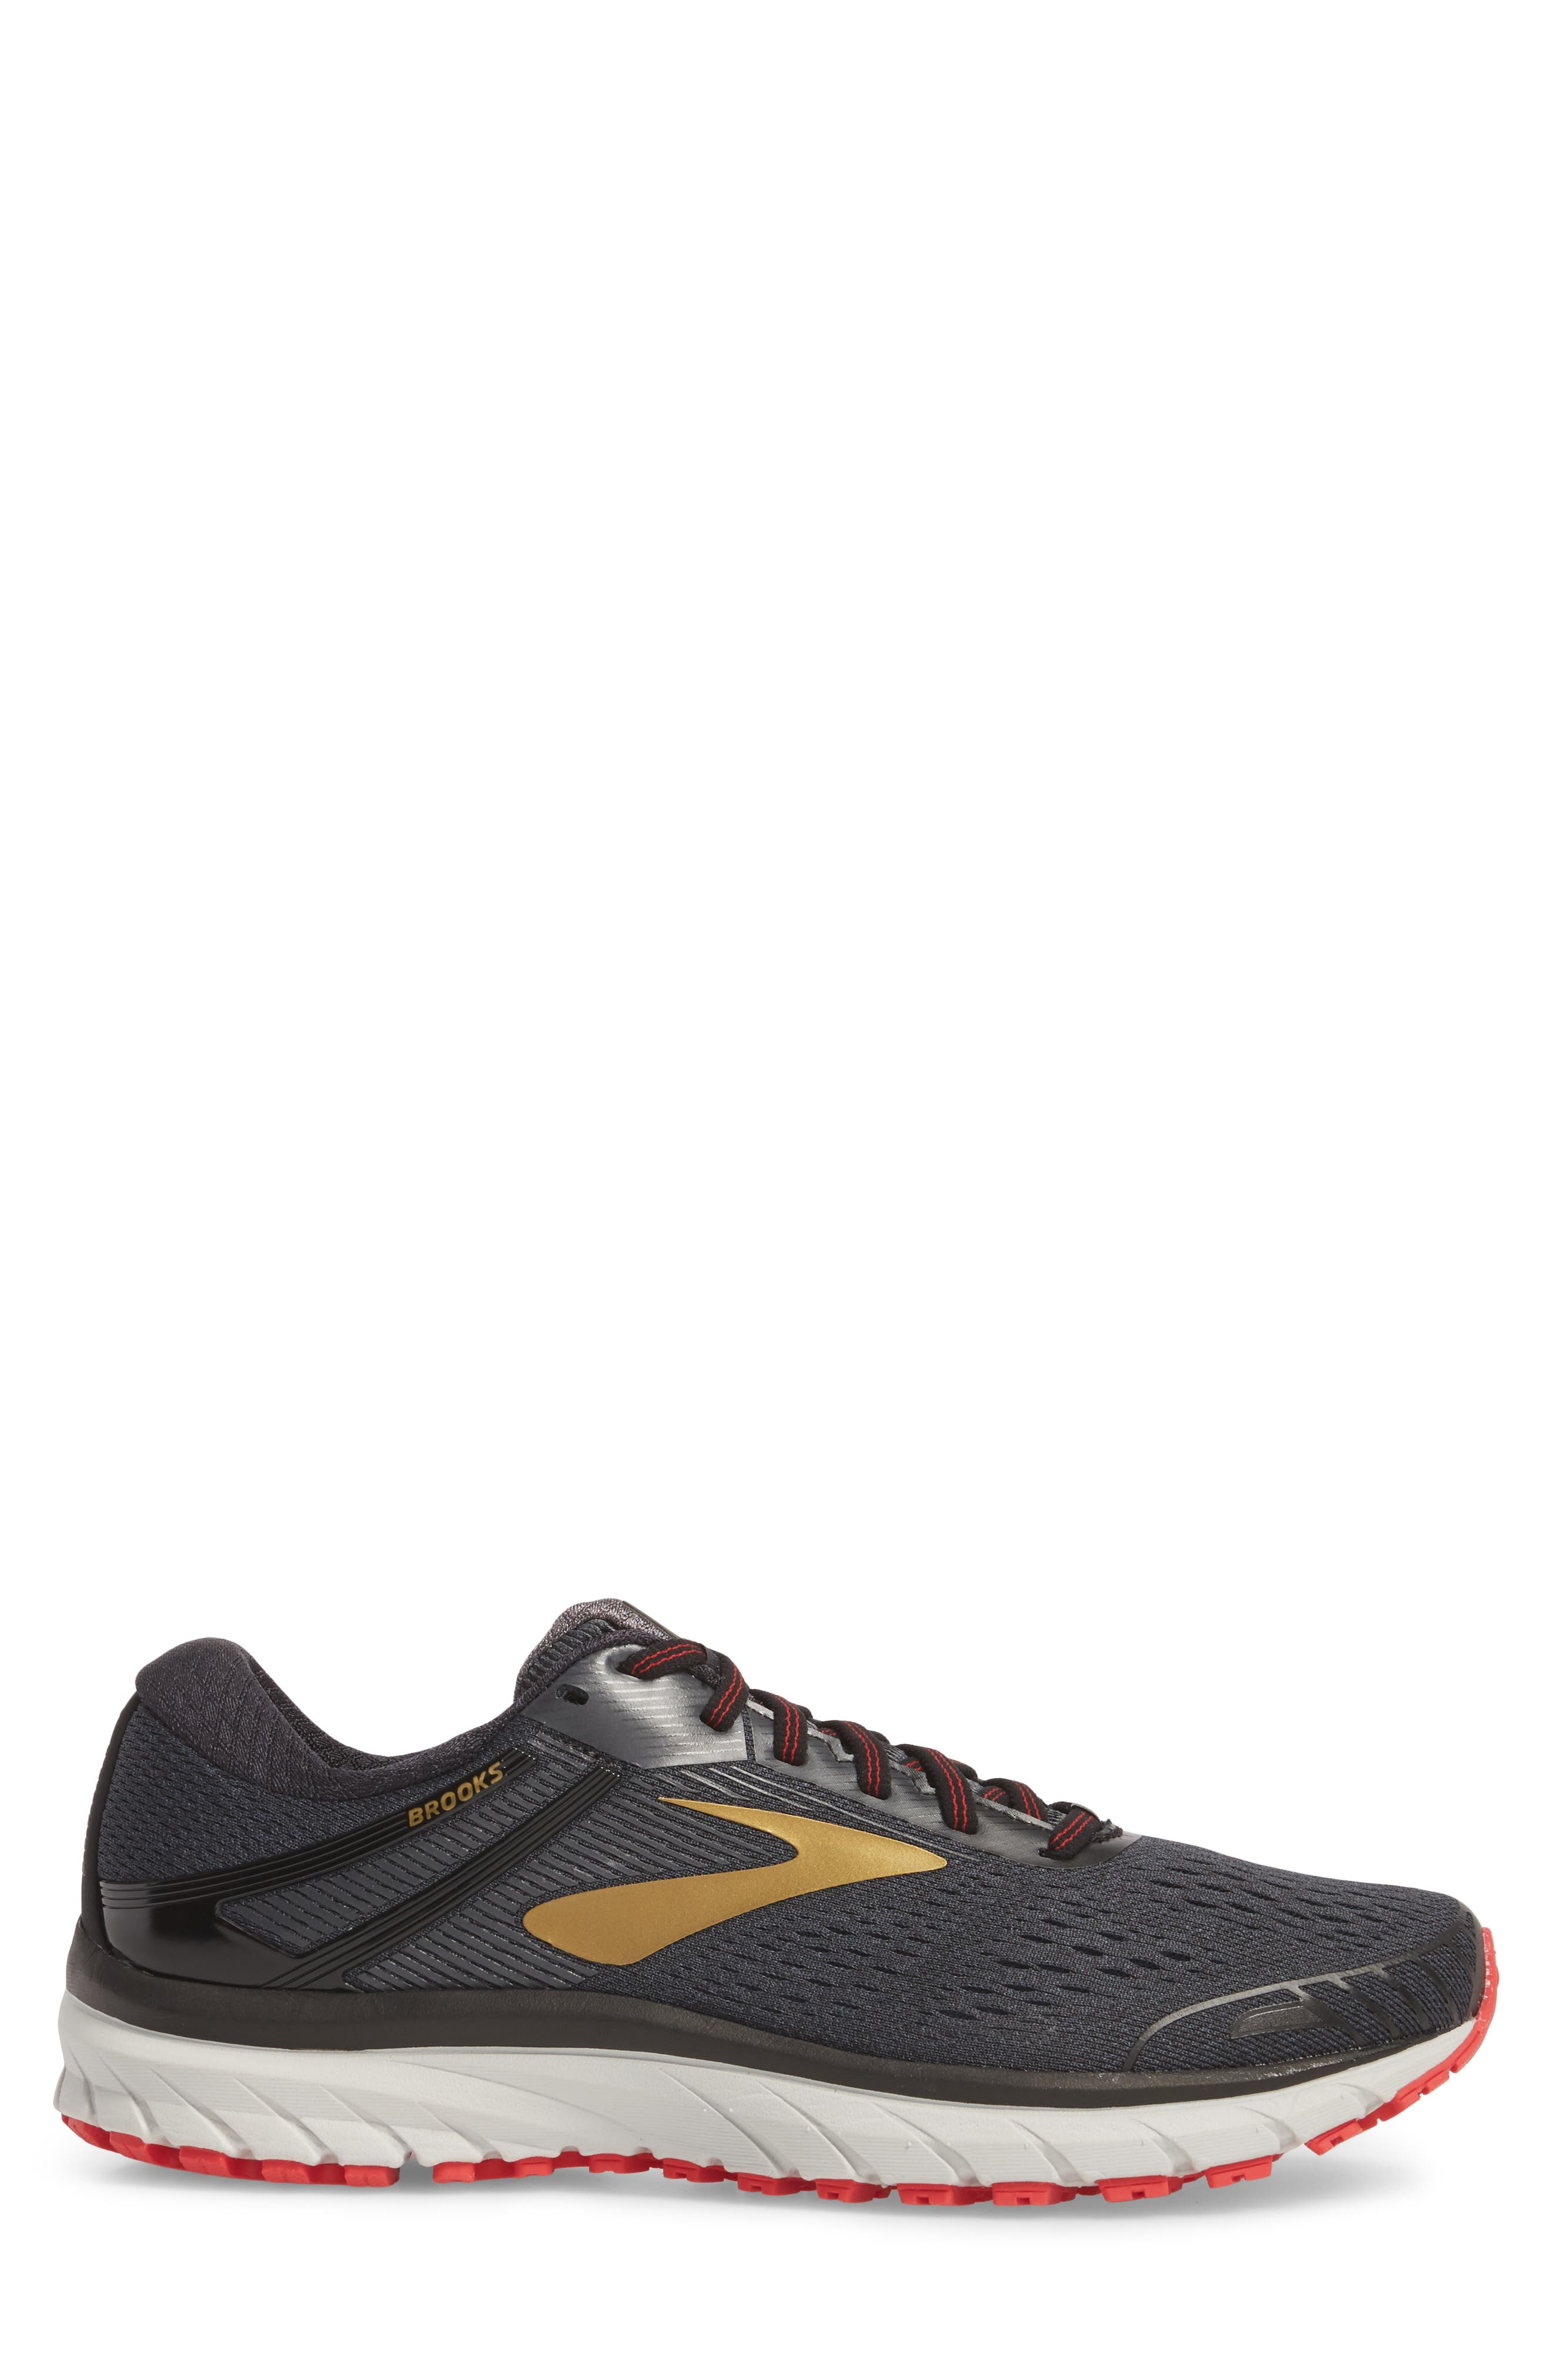 Alternate Image 3  - Brooks Adrenaline GTS 18 Running Shoe (Men)